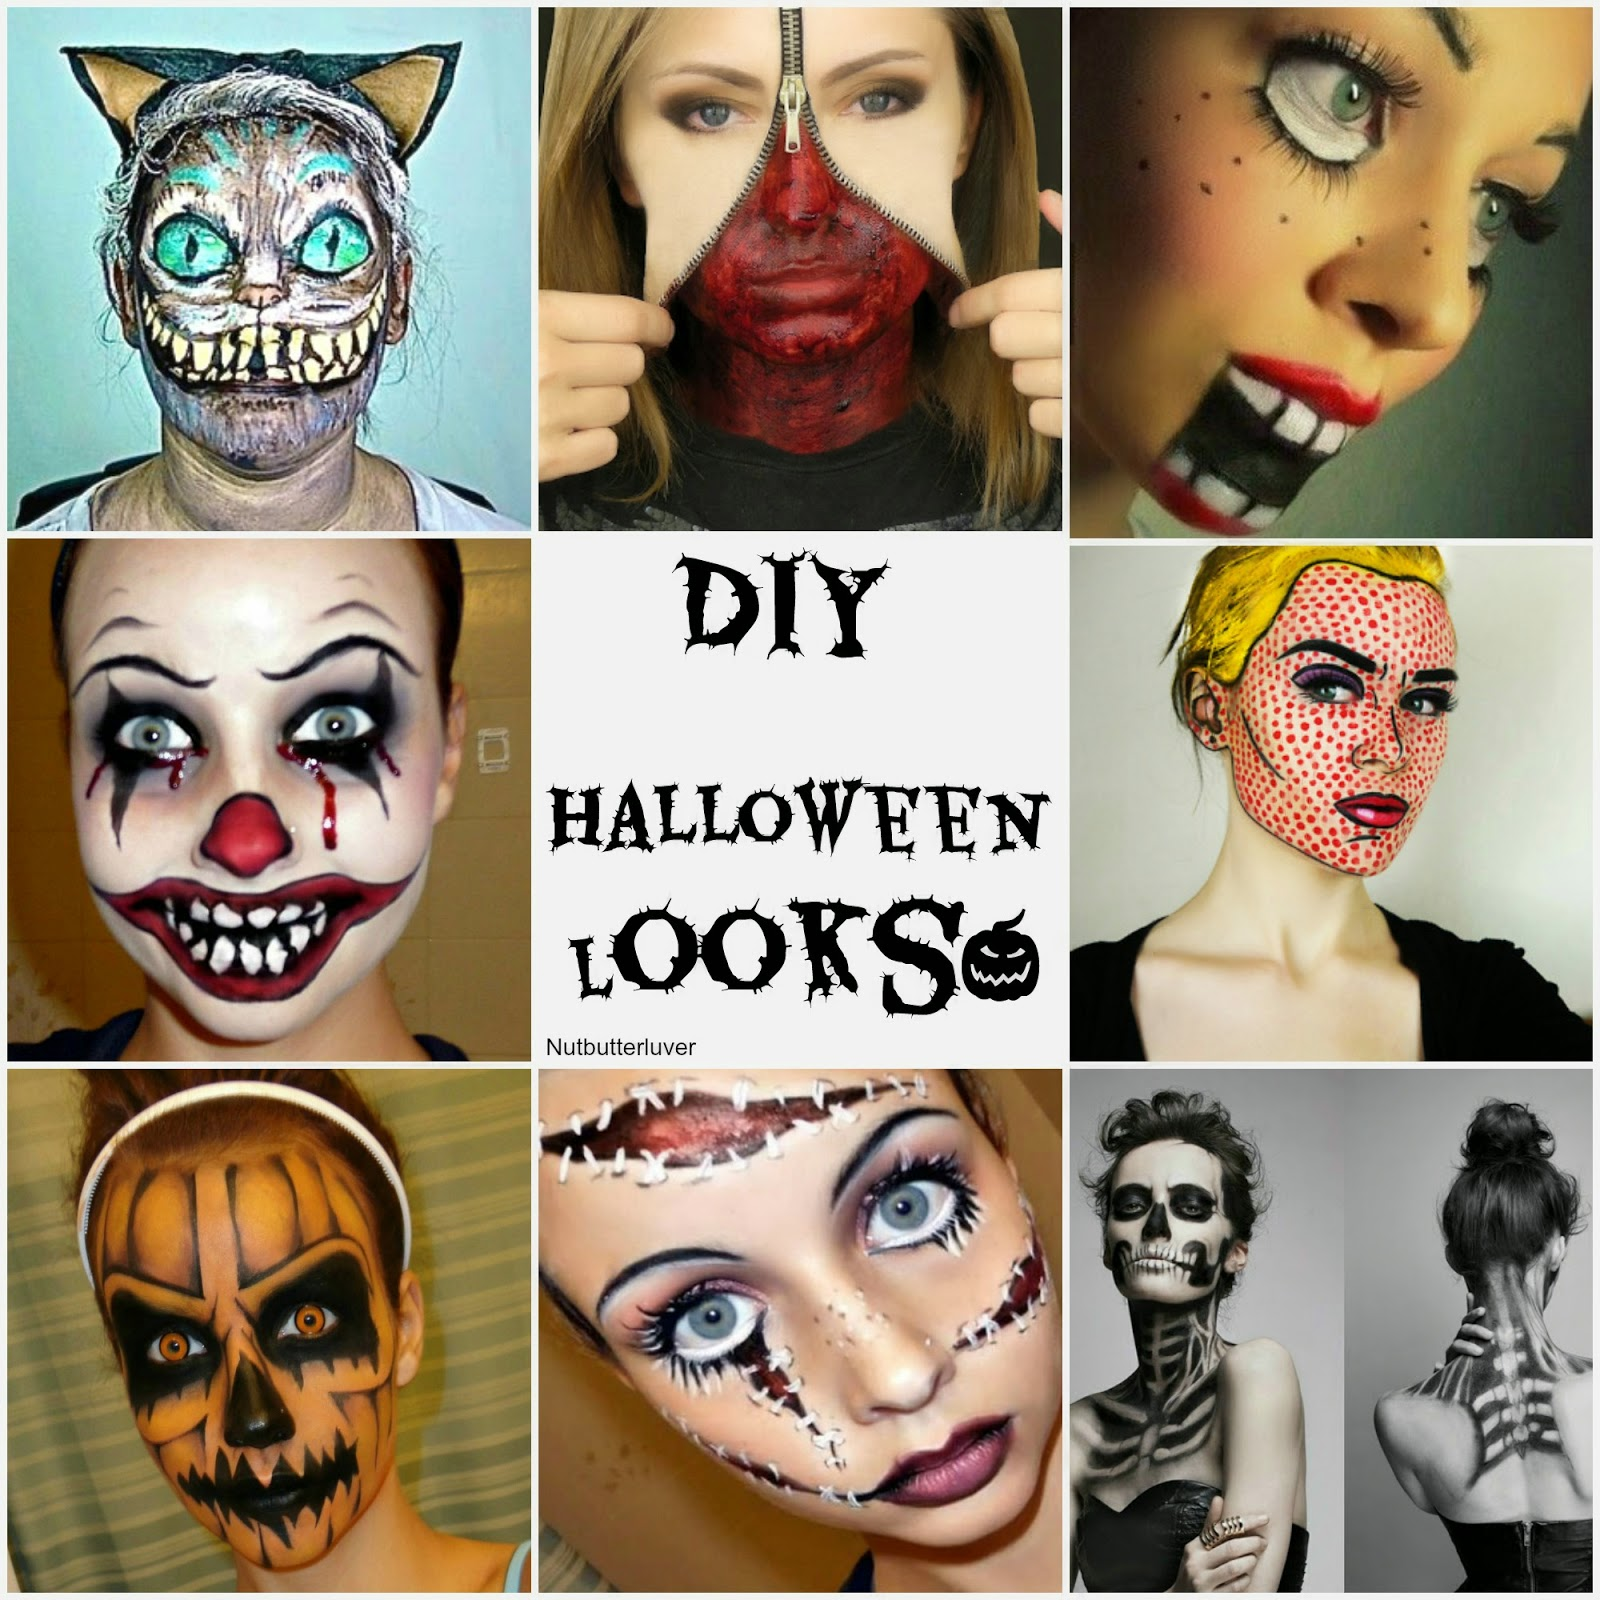 diy creepy halloween makeup looks - nutbutterluver